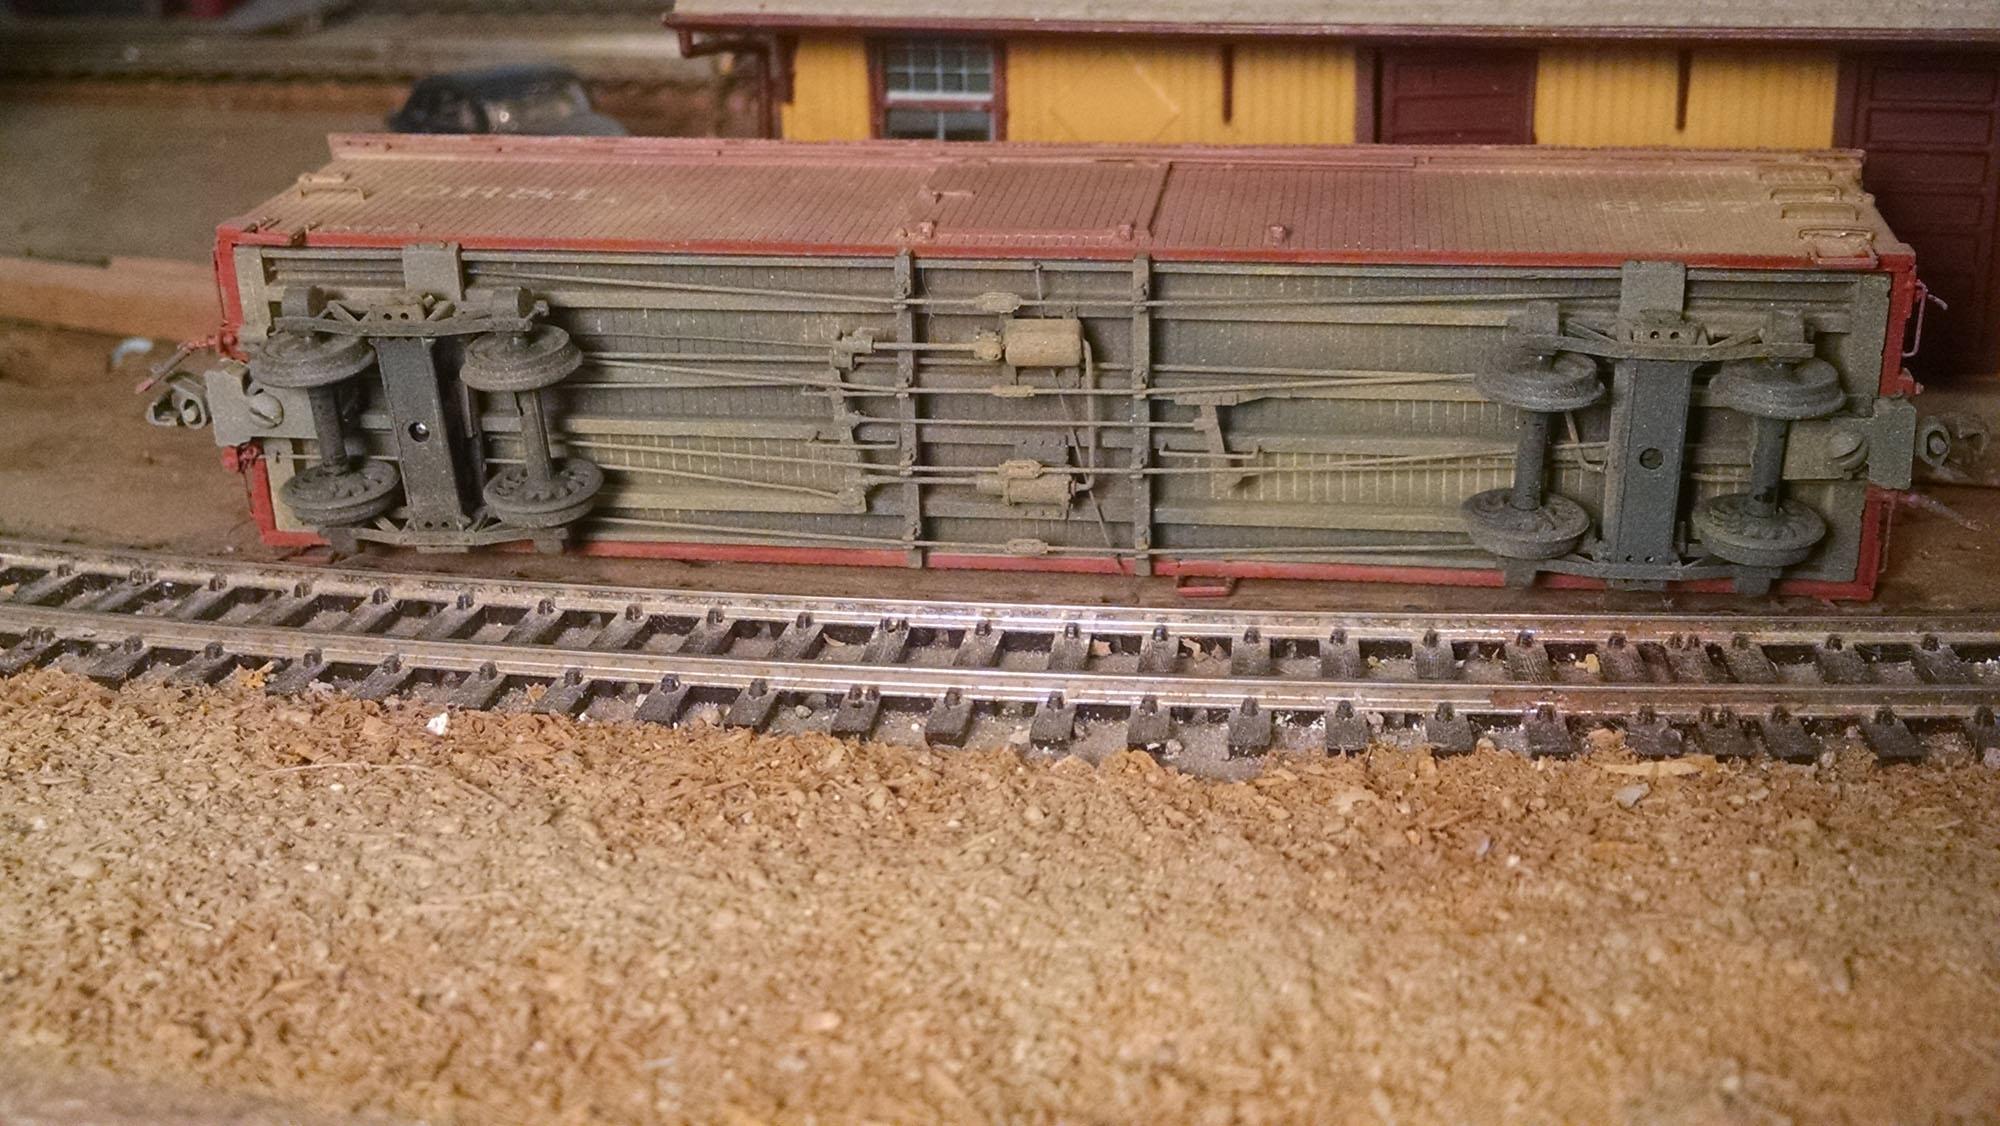 john-leow-or-l-boxcar-2.jpg